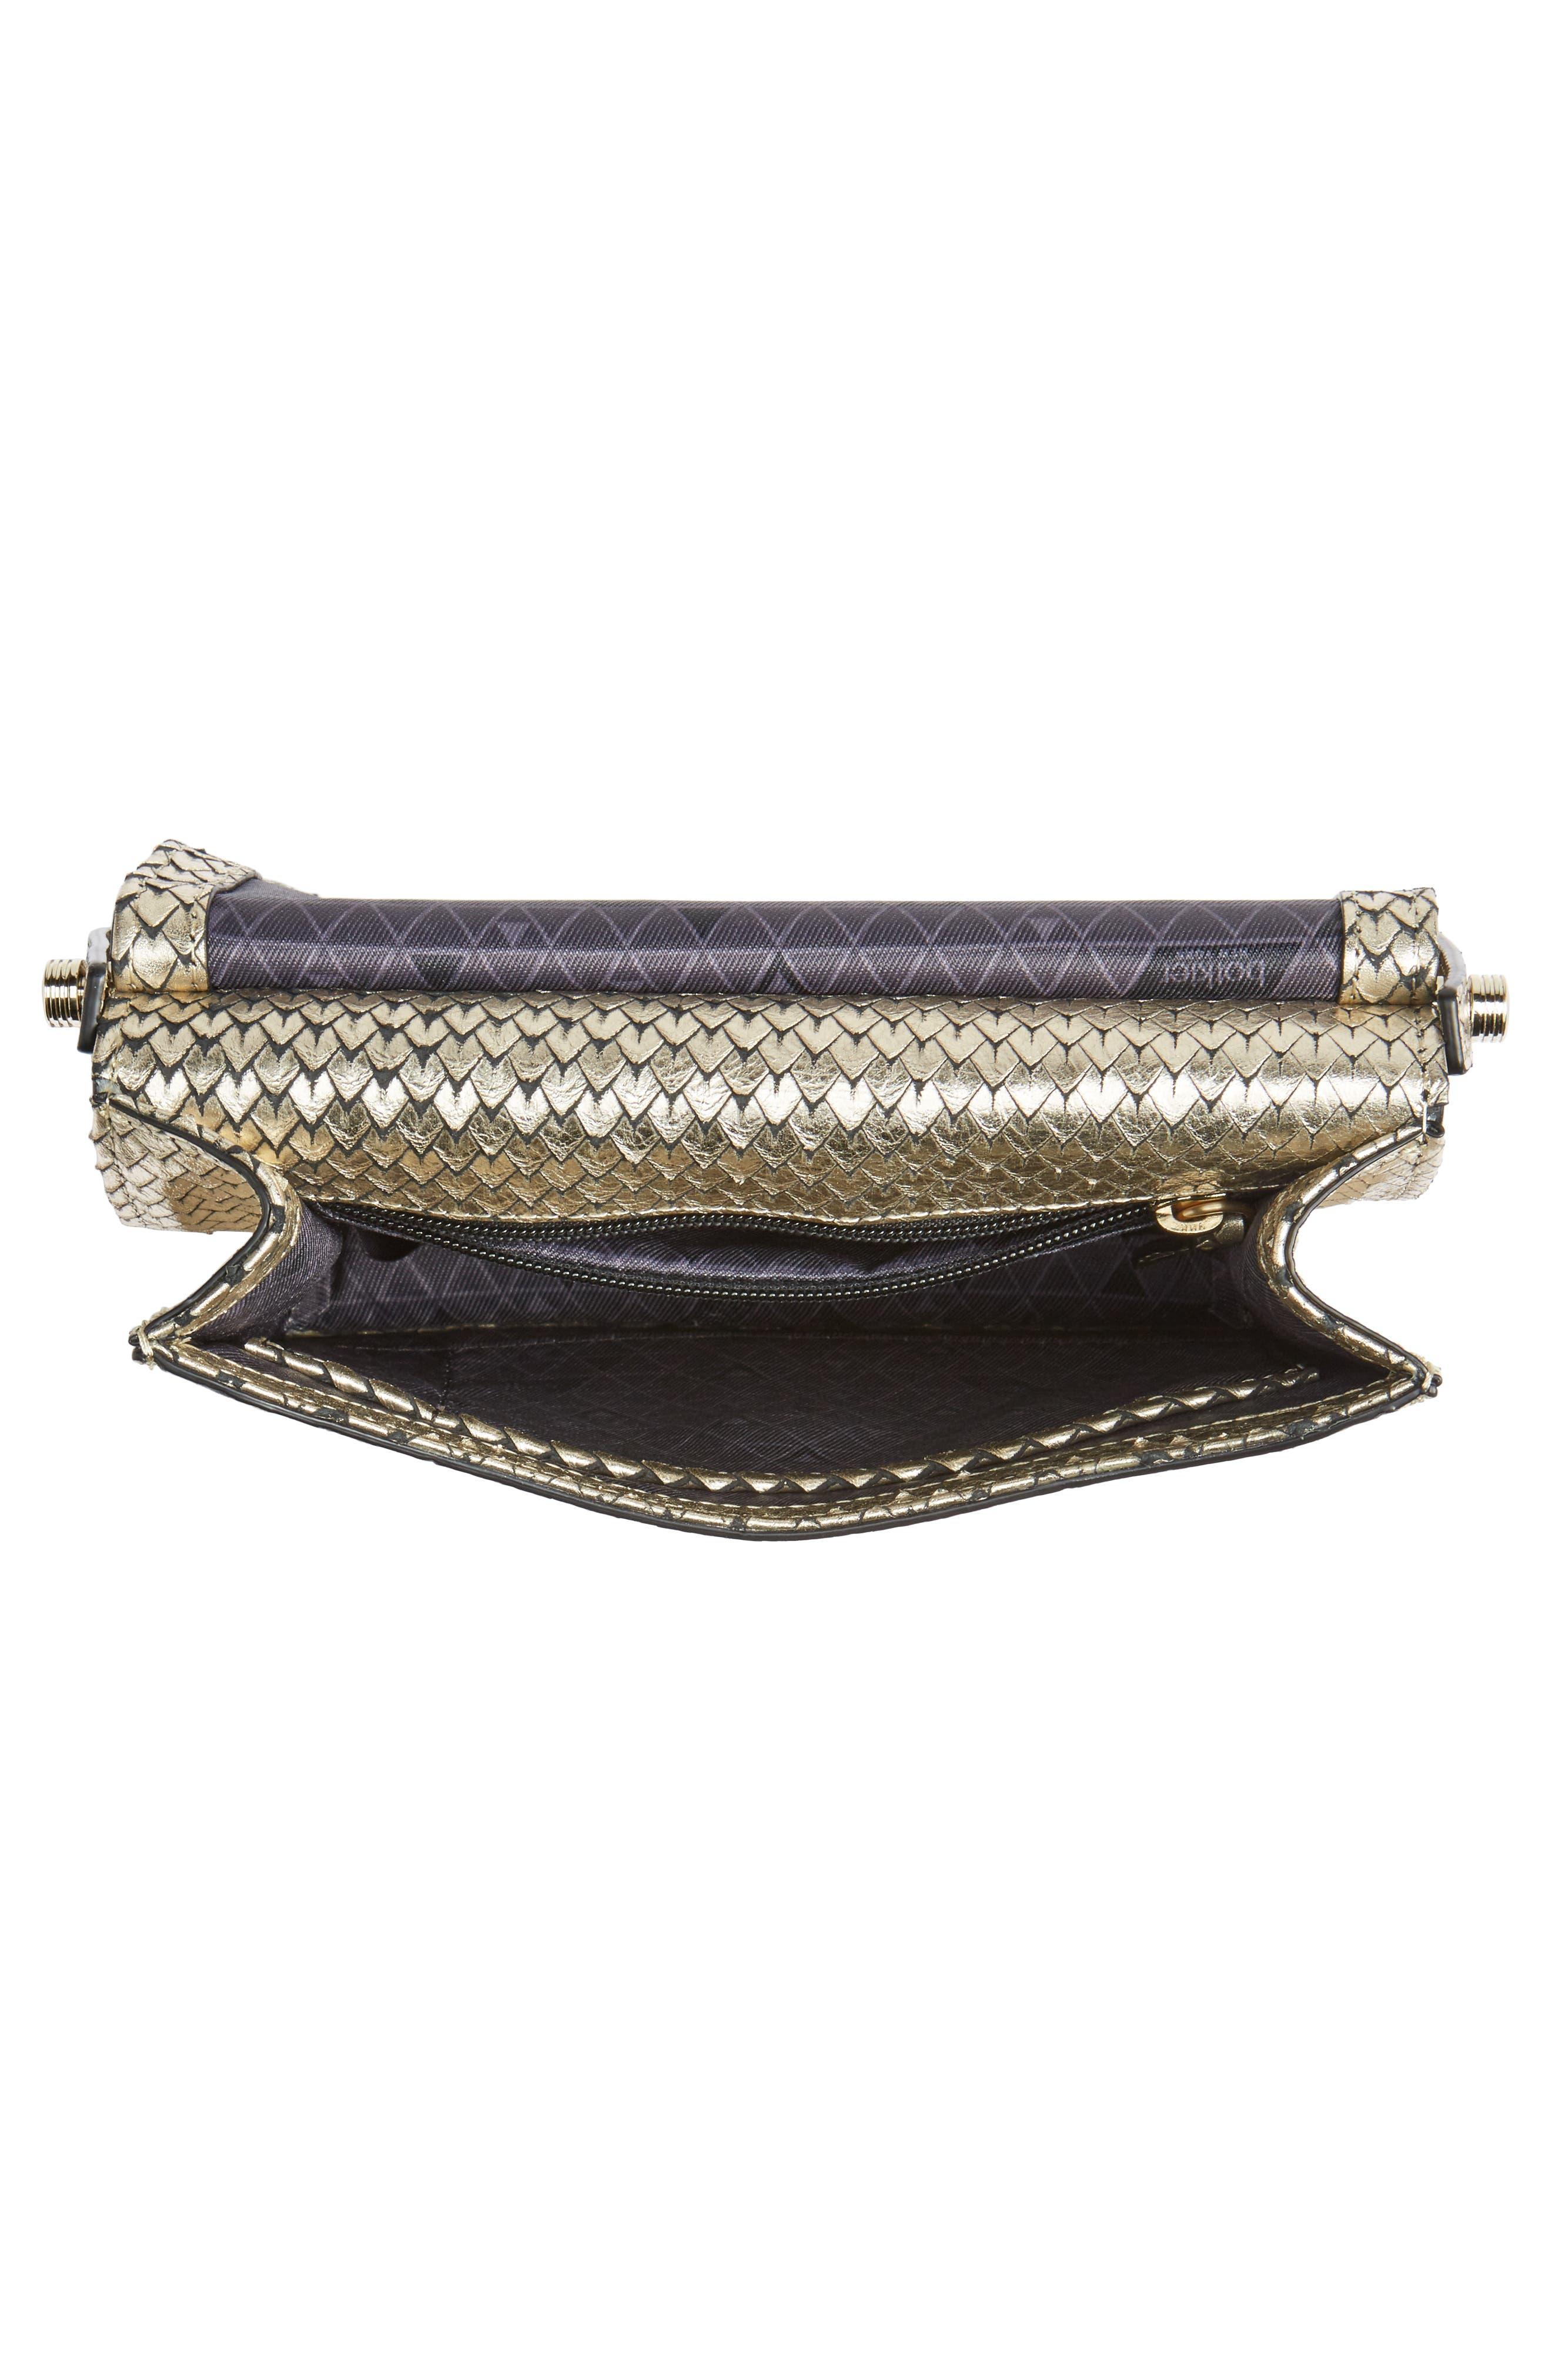 Crawford Calfskin Leather Crossbody Bag,                             Alternate thumbnail 4, color,                             Gold